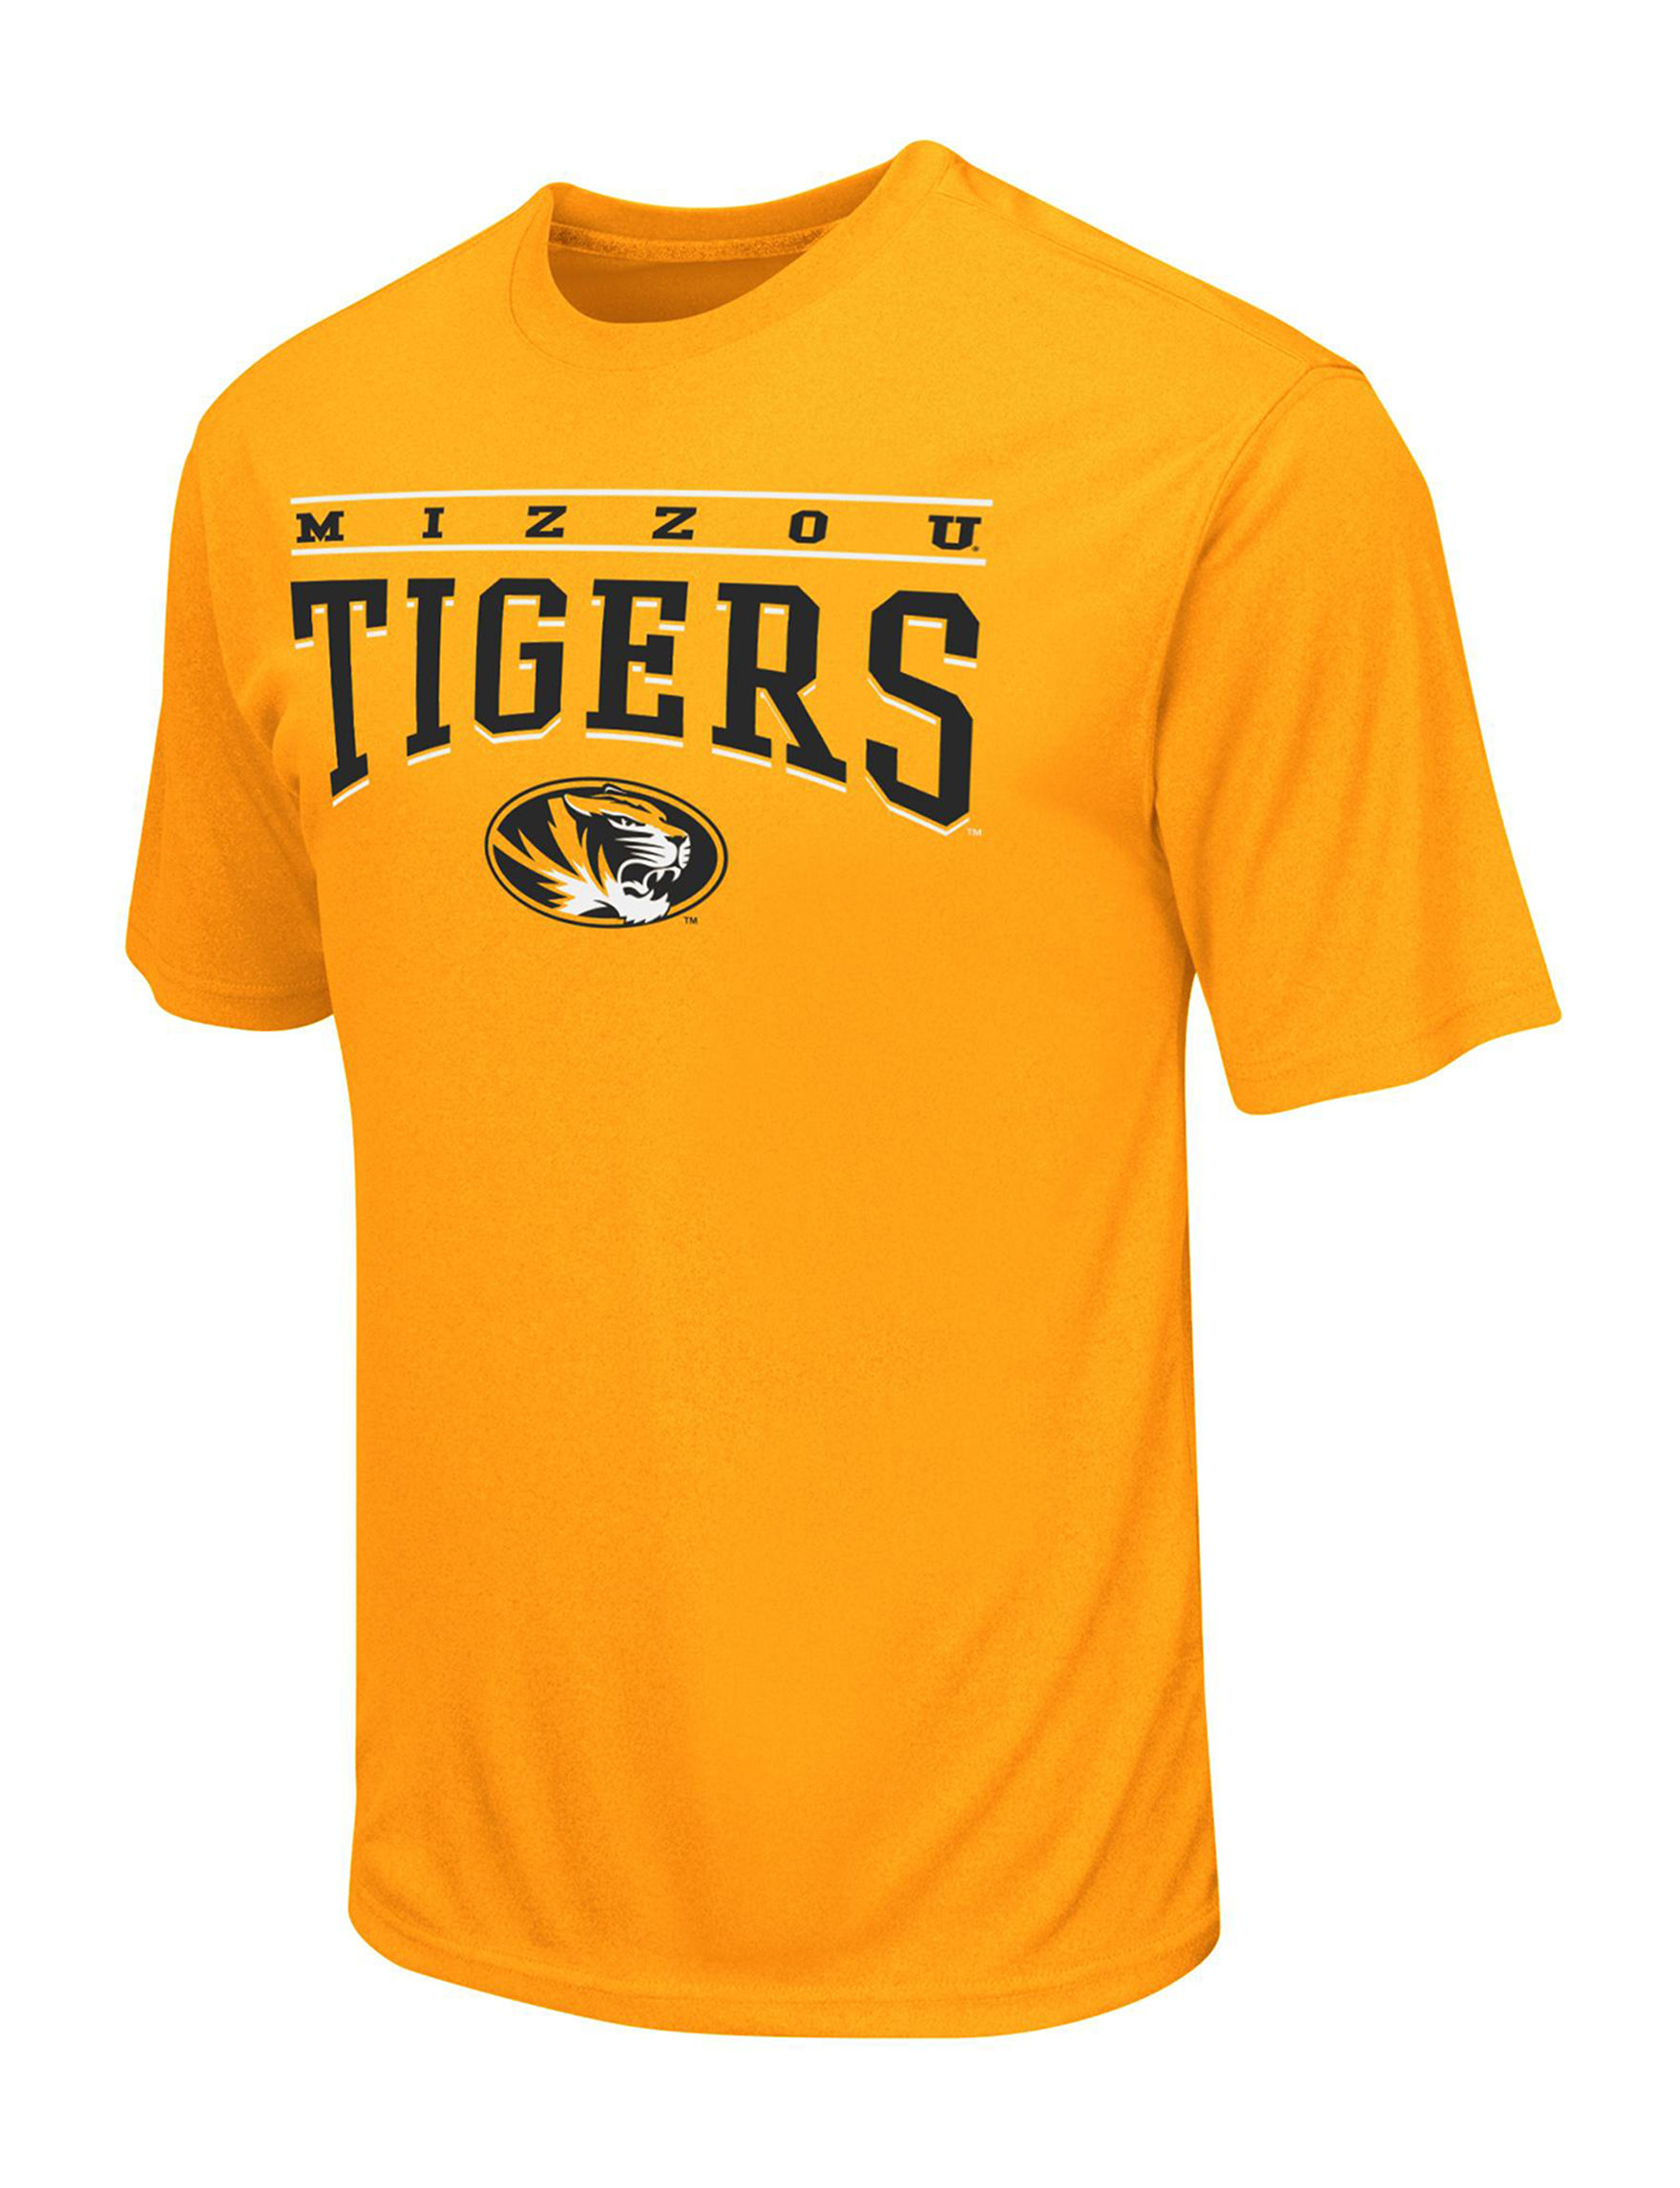 NCAA Medium Yellow Tees & Tanks